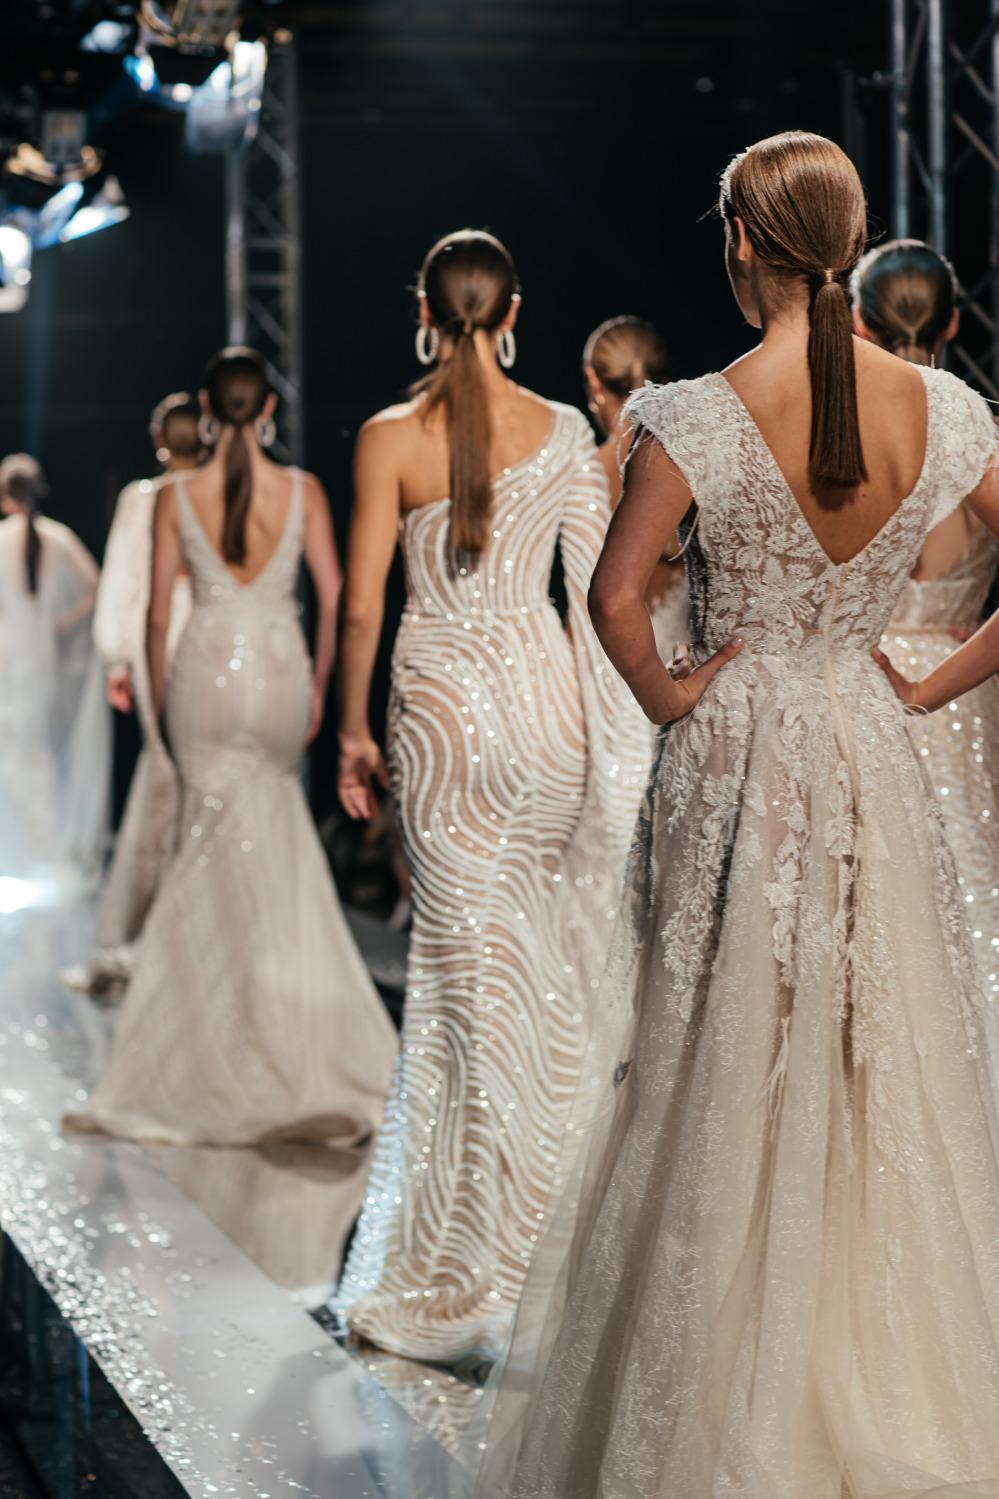 Wedding Fashion 2020: The Biggest Trends